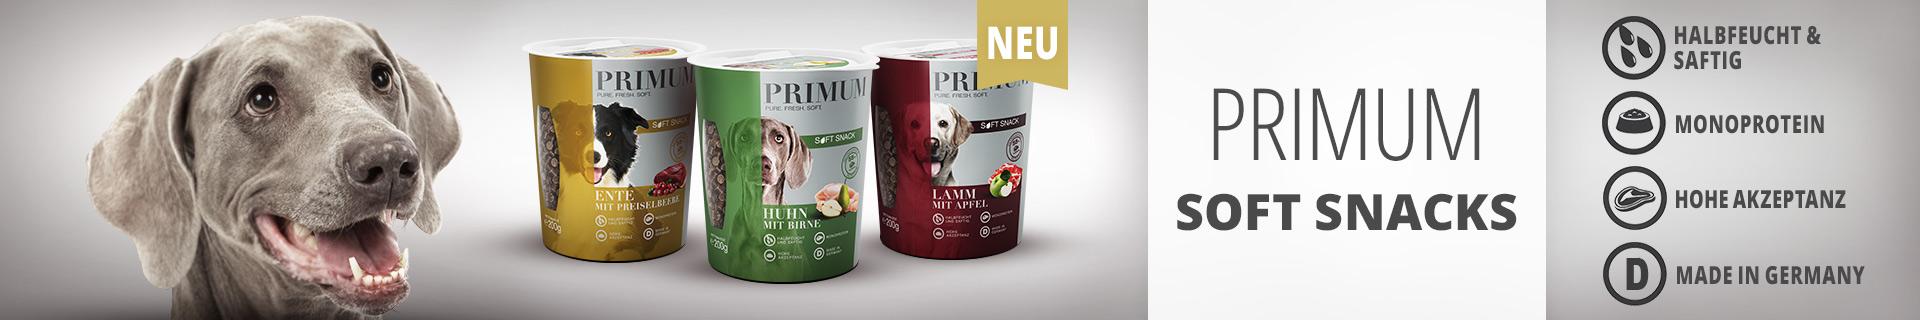 Jetzt neu: PRIMUM Soft Snacks